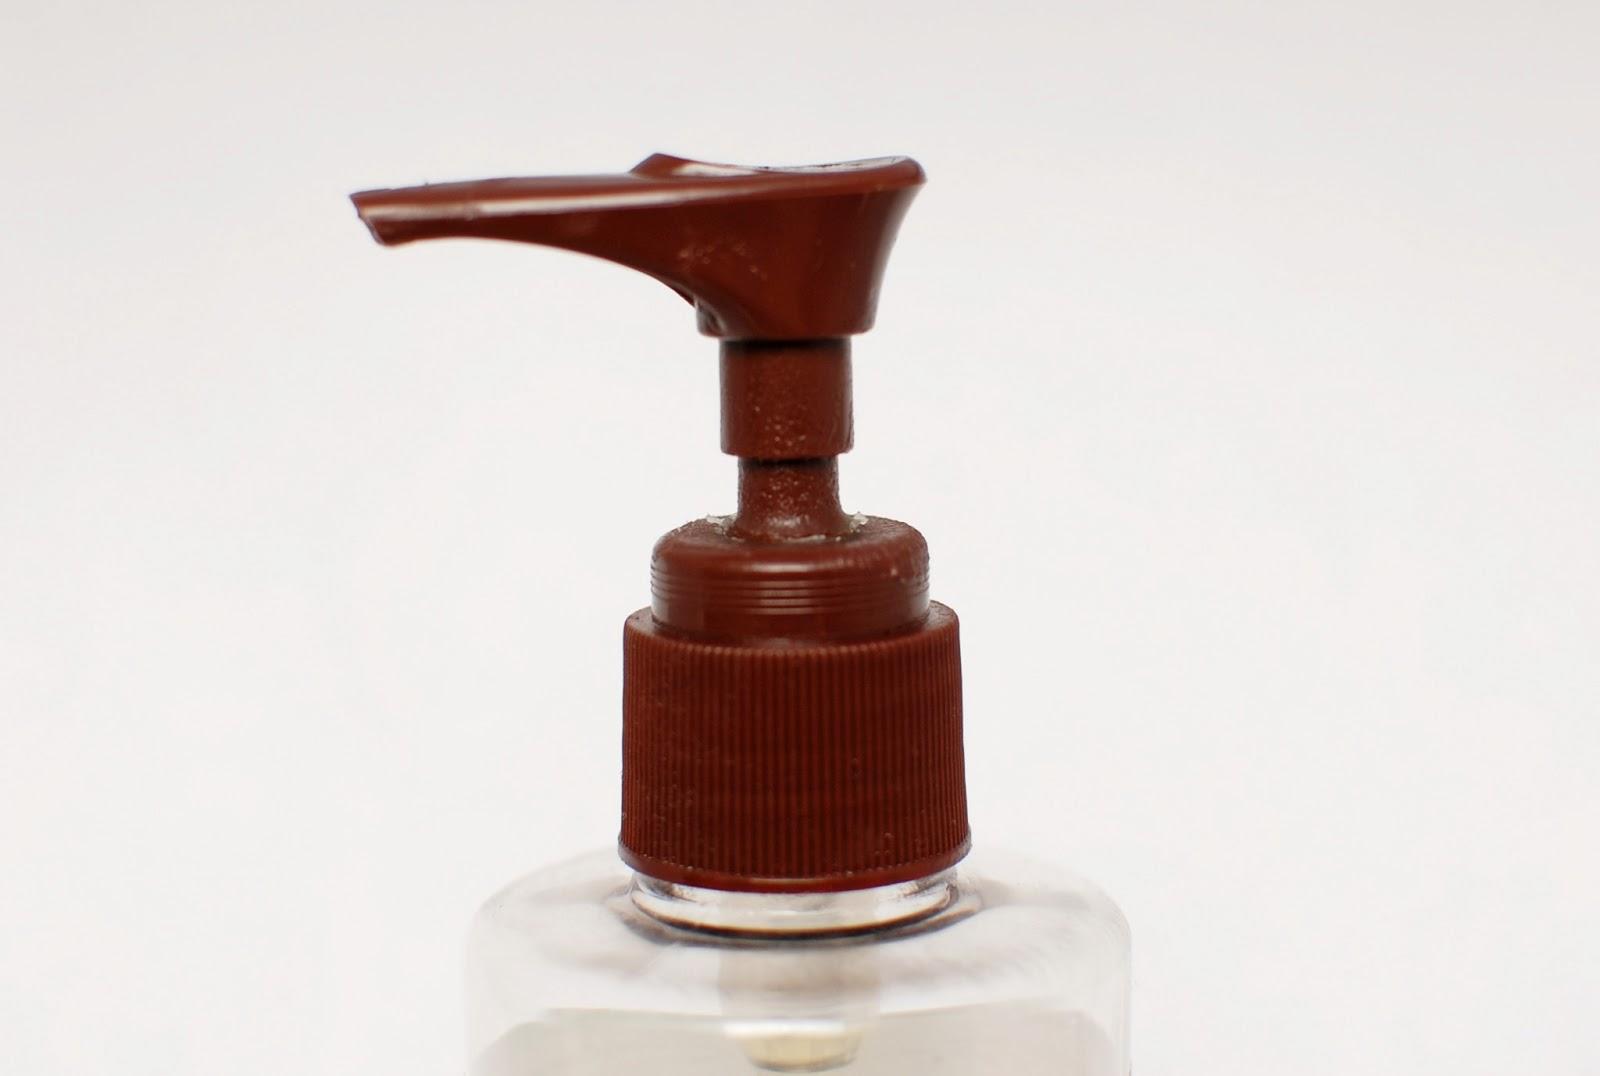 Desert Essence Thoroughly Clean Face Wash pump